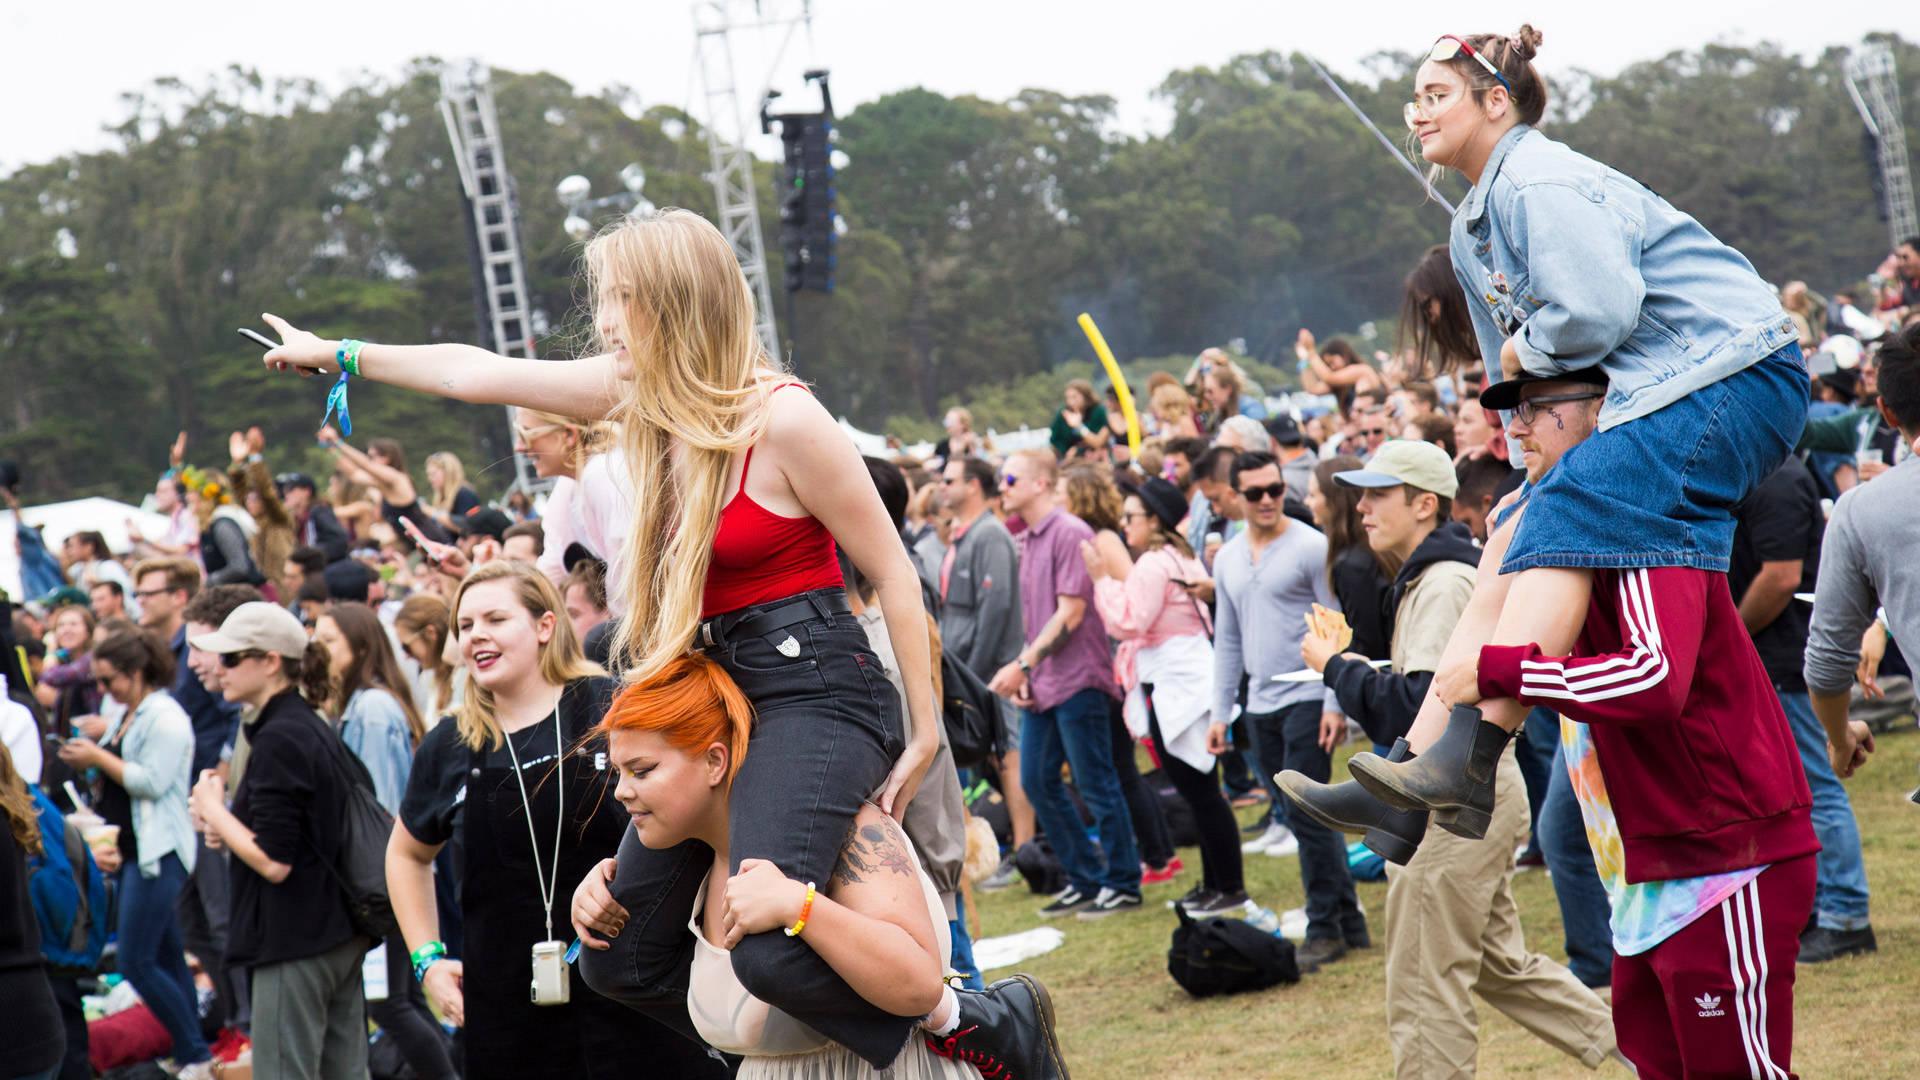 The crowd at 2017's Outside Lands in Golden Gate Park.  Estefany Gonzalez